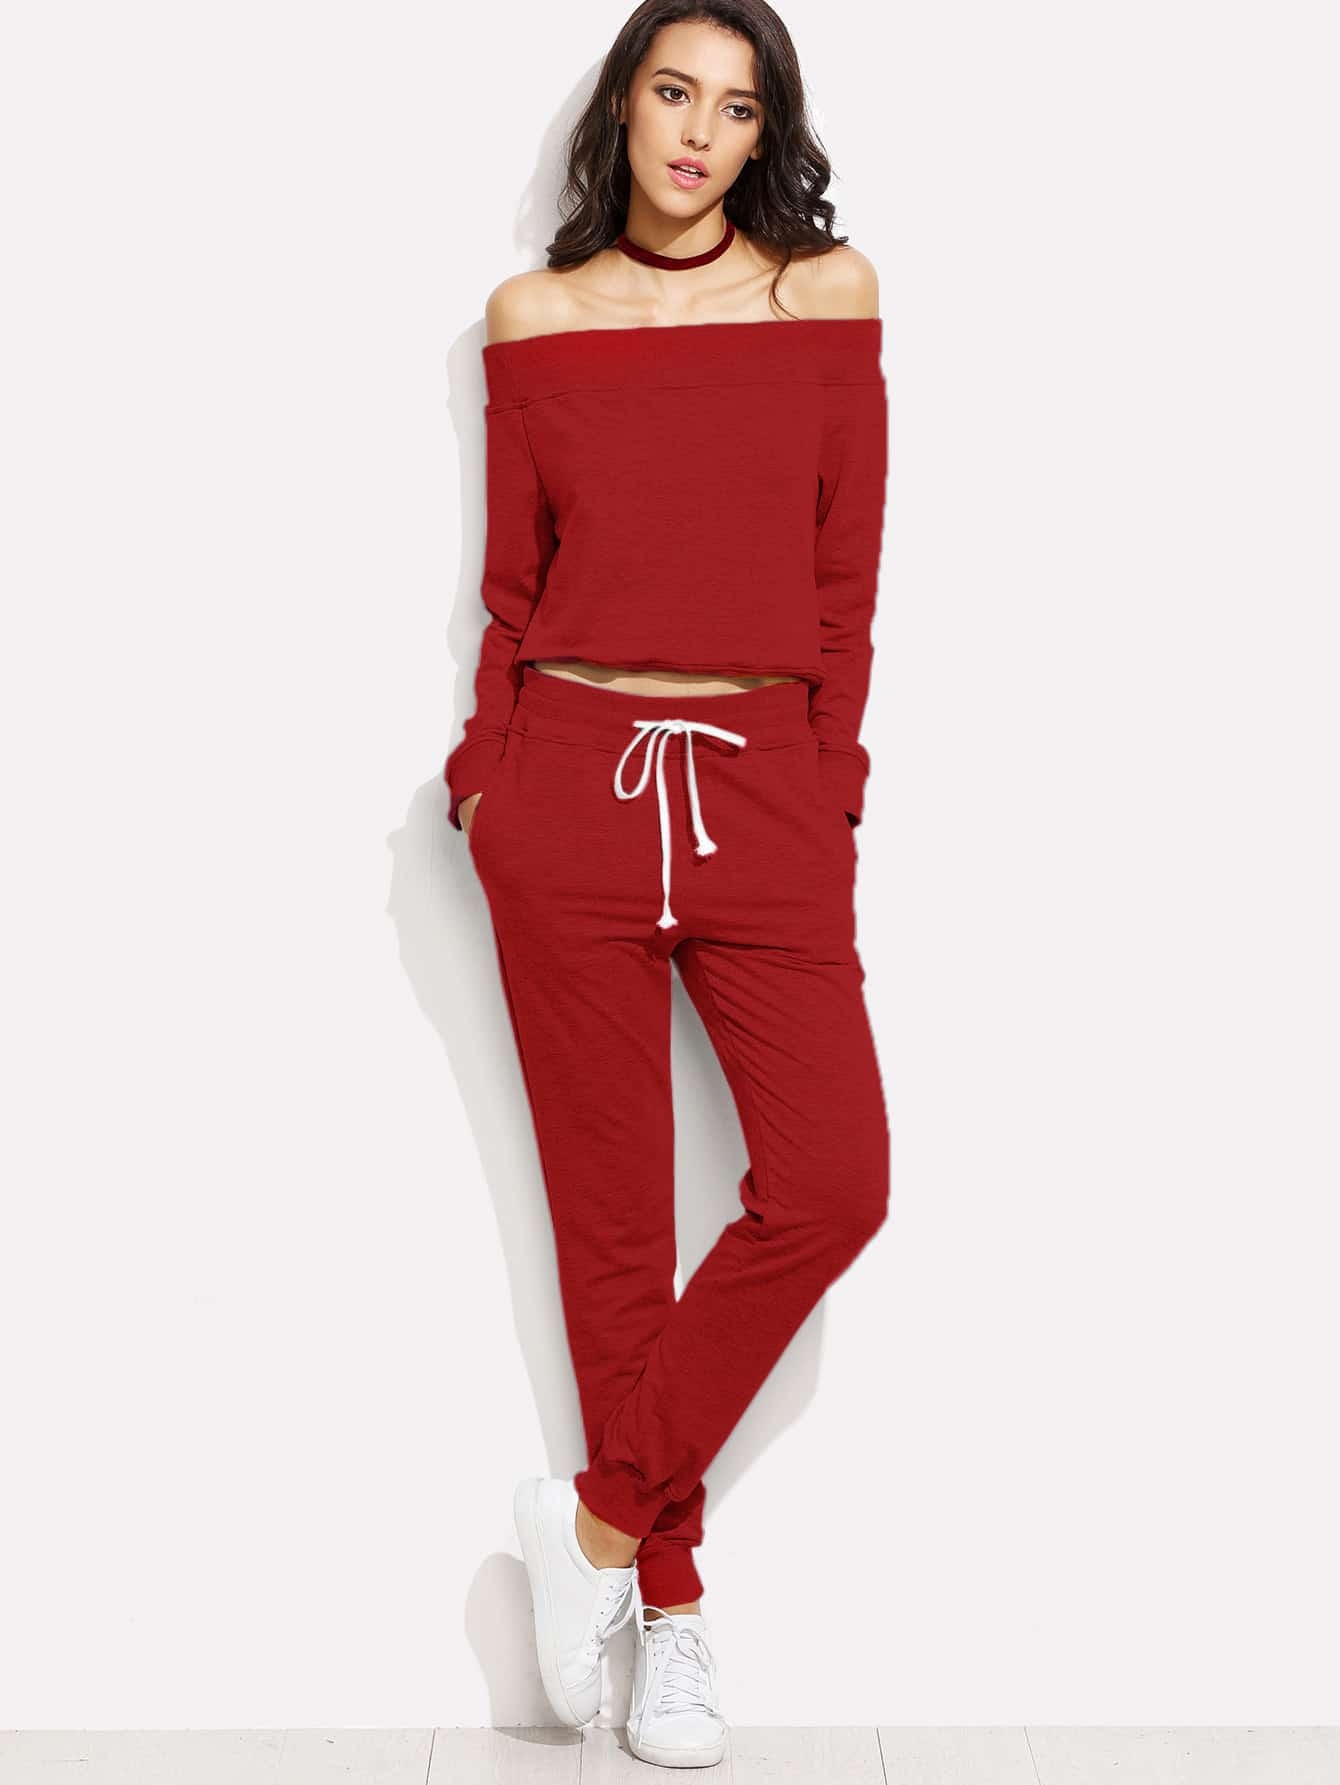 Bardot Neckline Top With Drawstring Pants